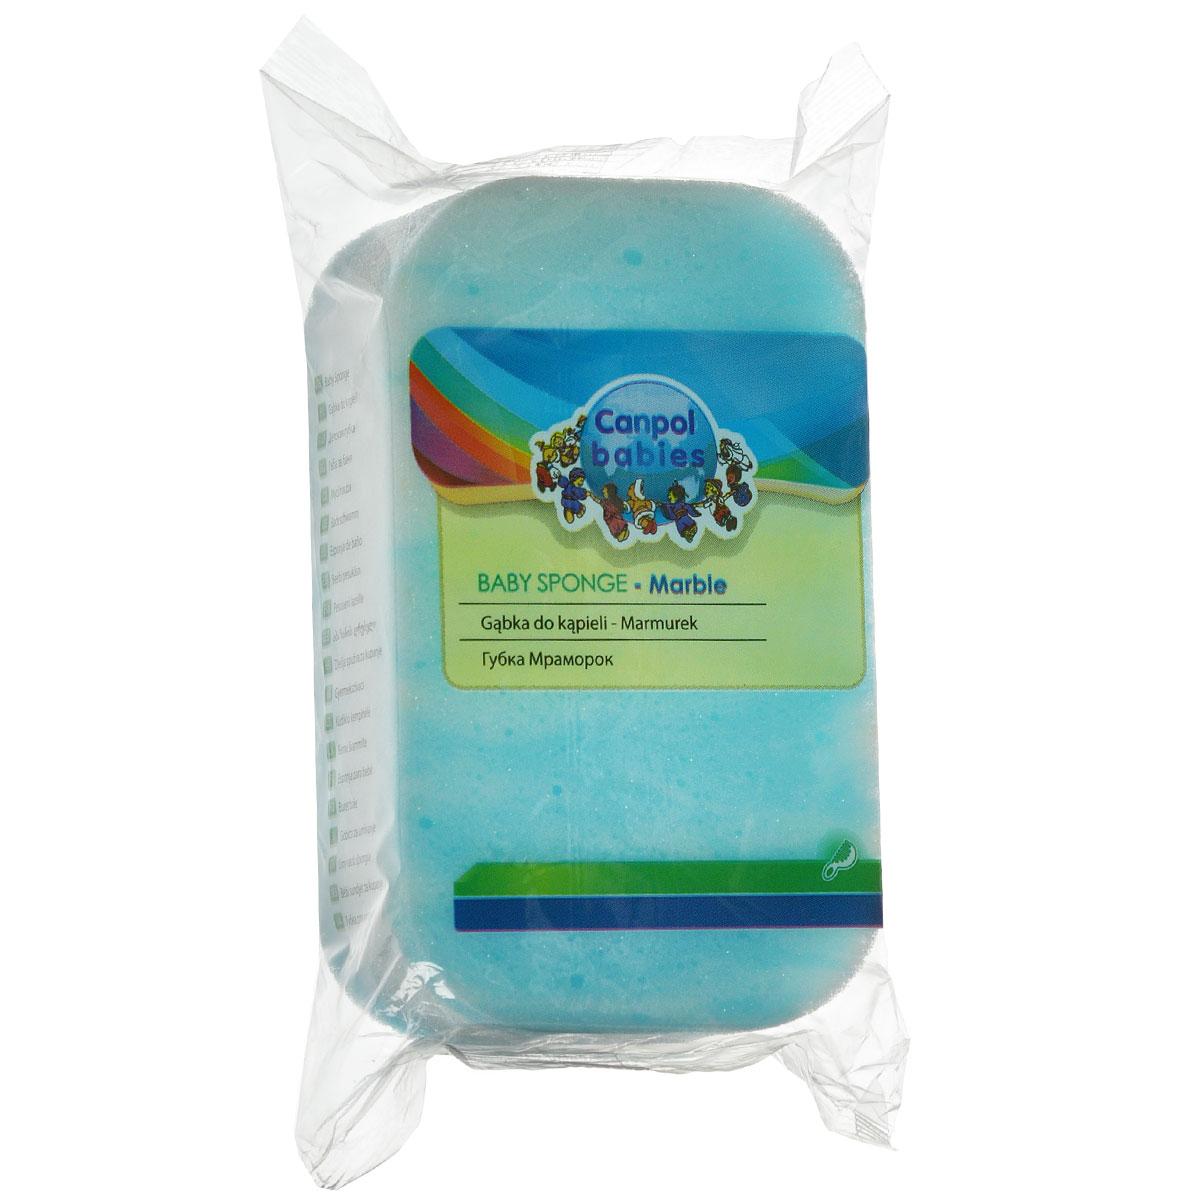 Canpol Babies Губка для купания Marble цвет голубой